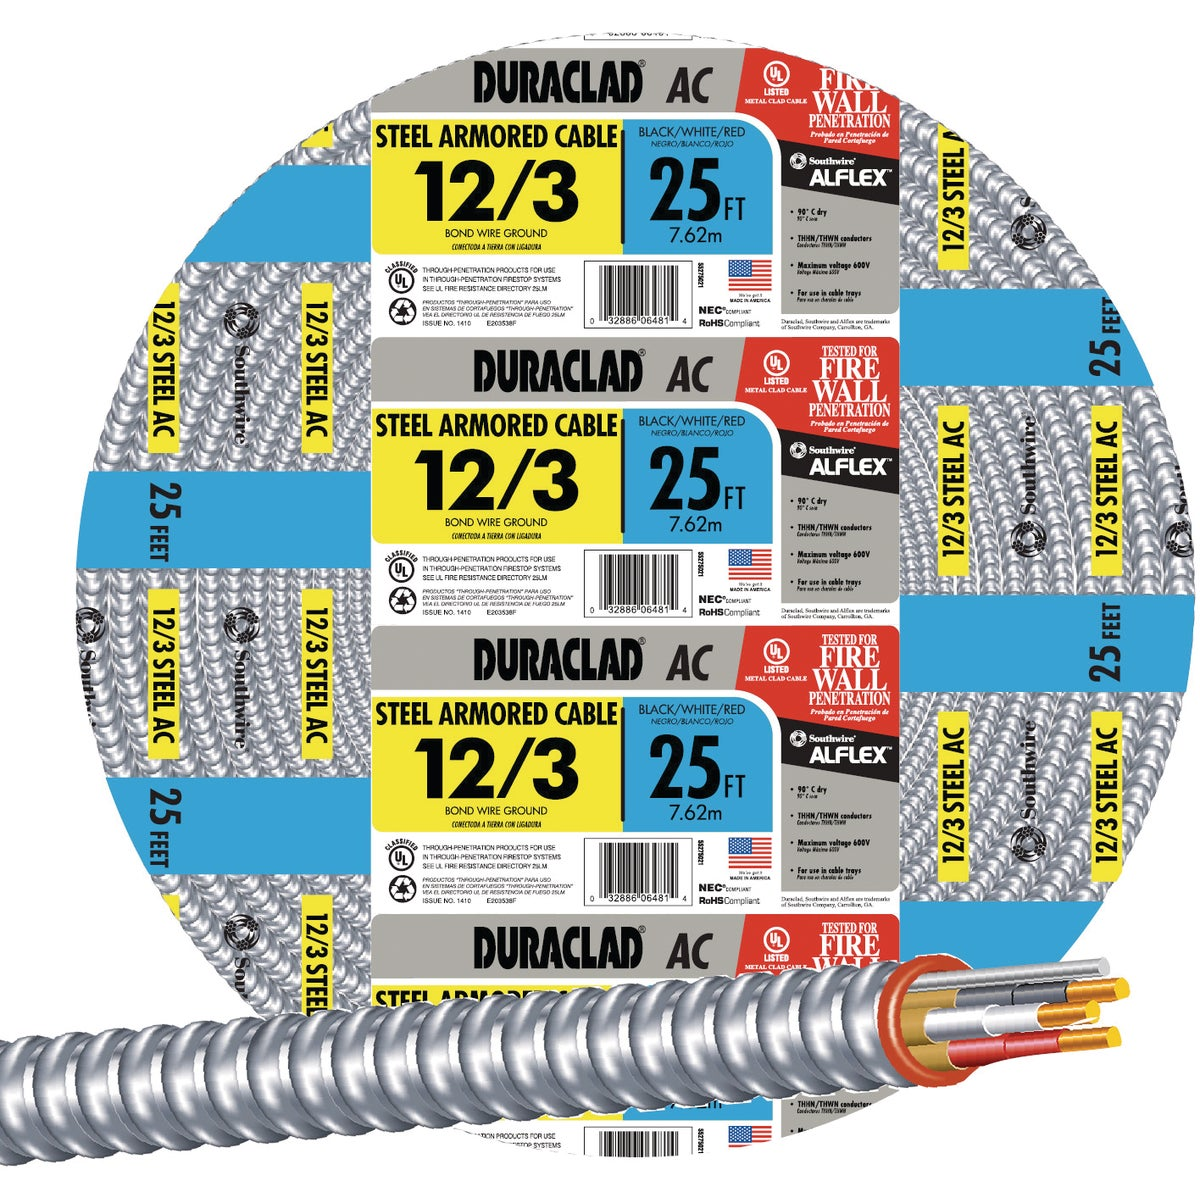 25' 12/3 STL ARMOR CABLE